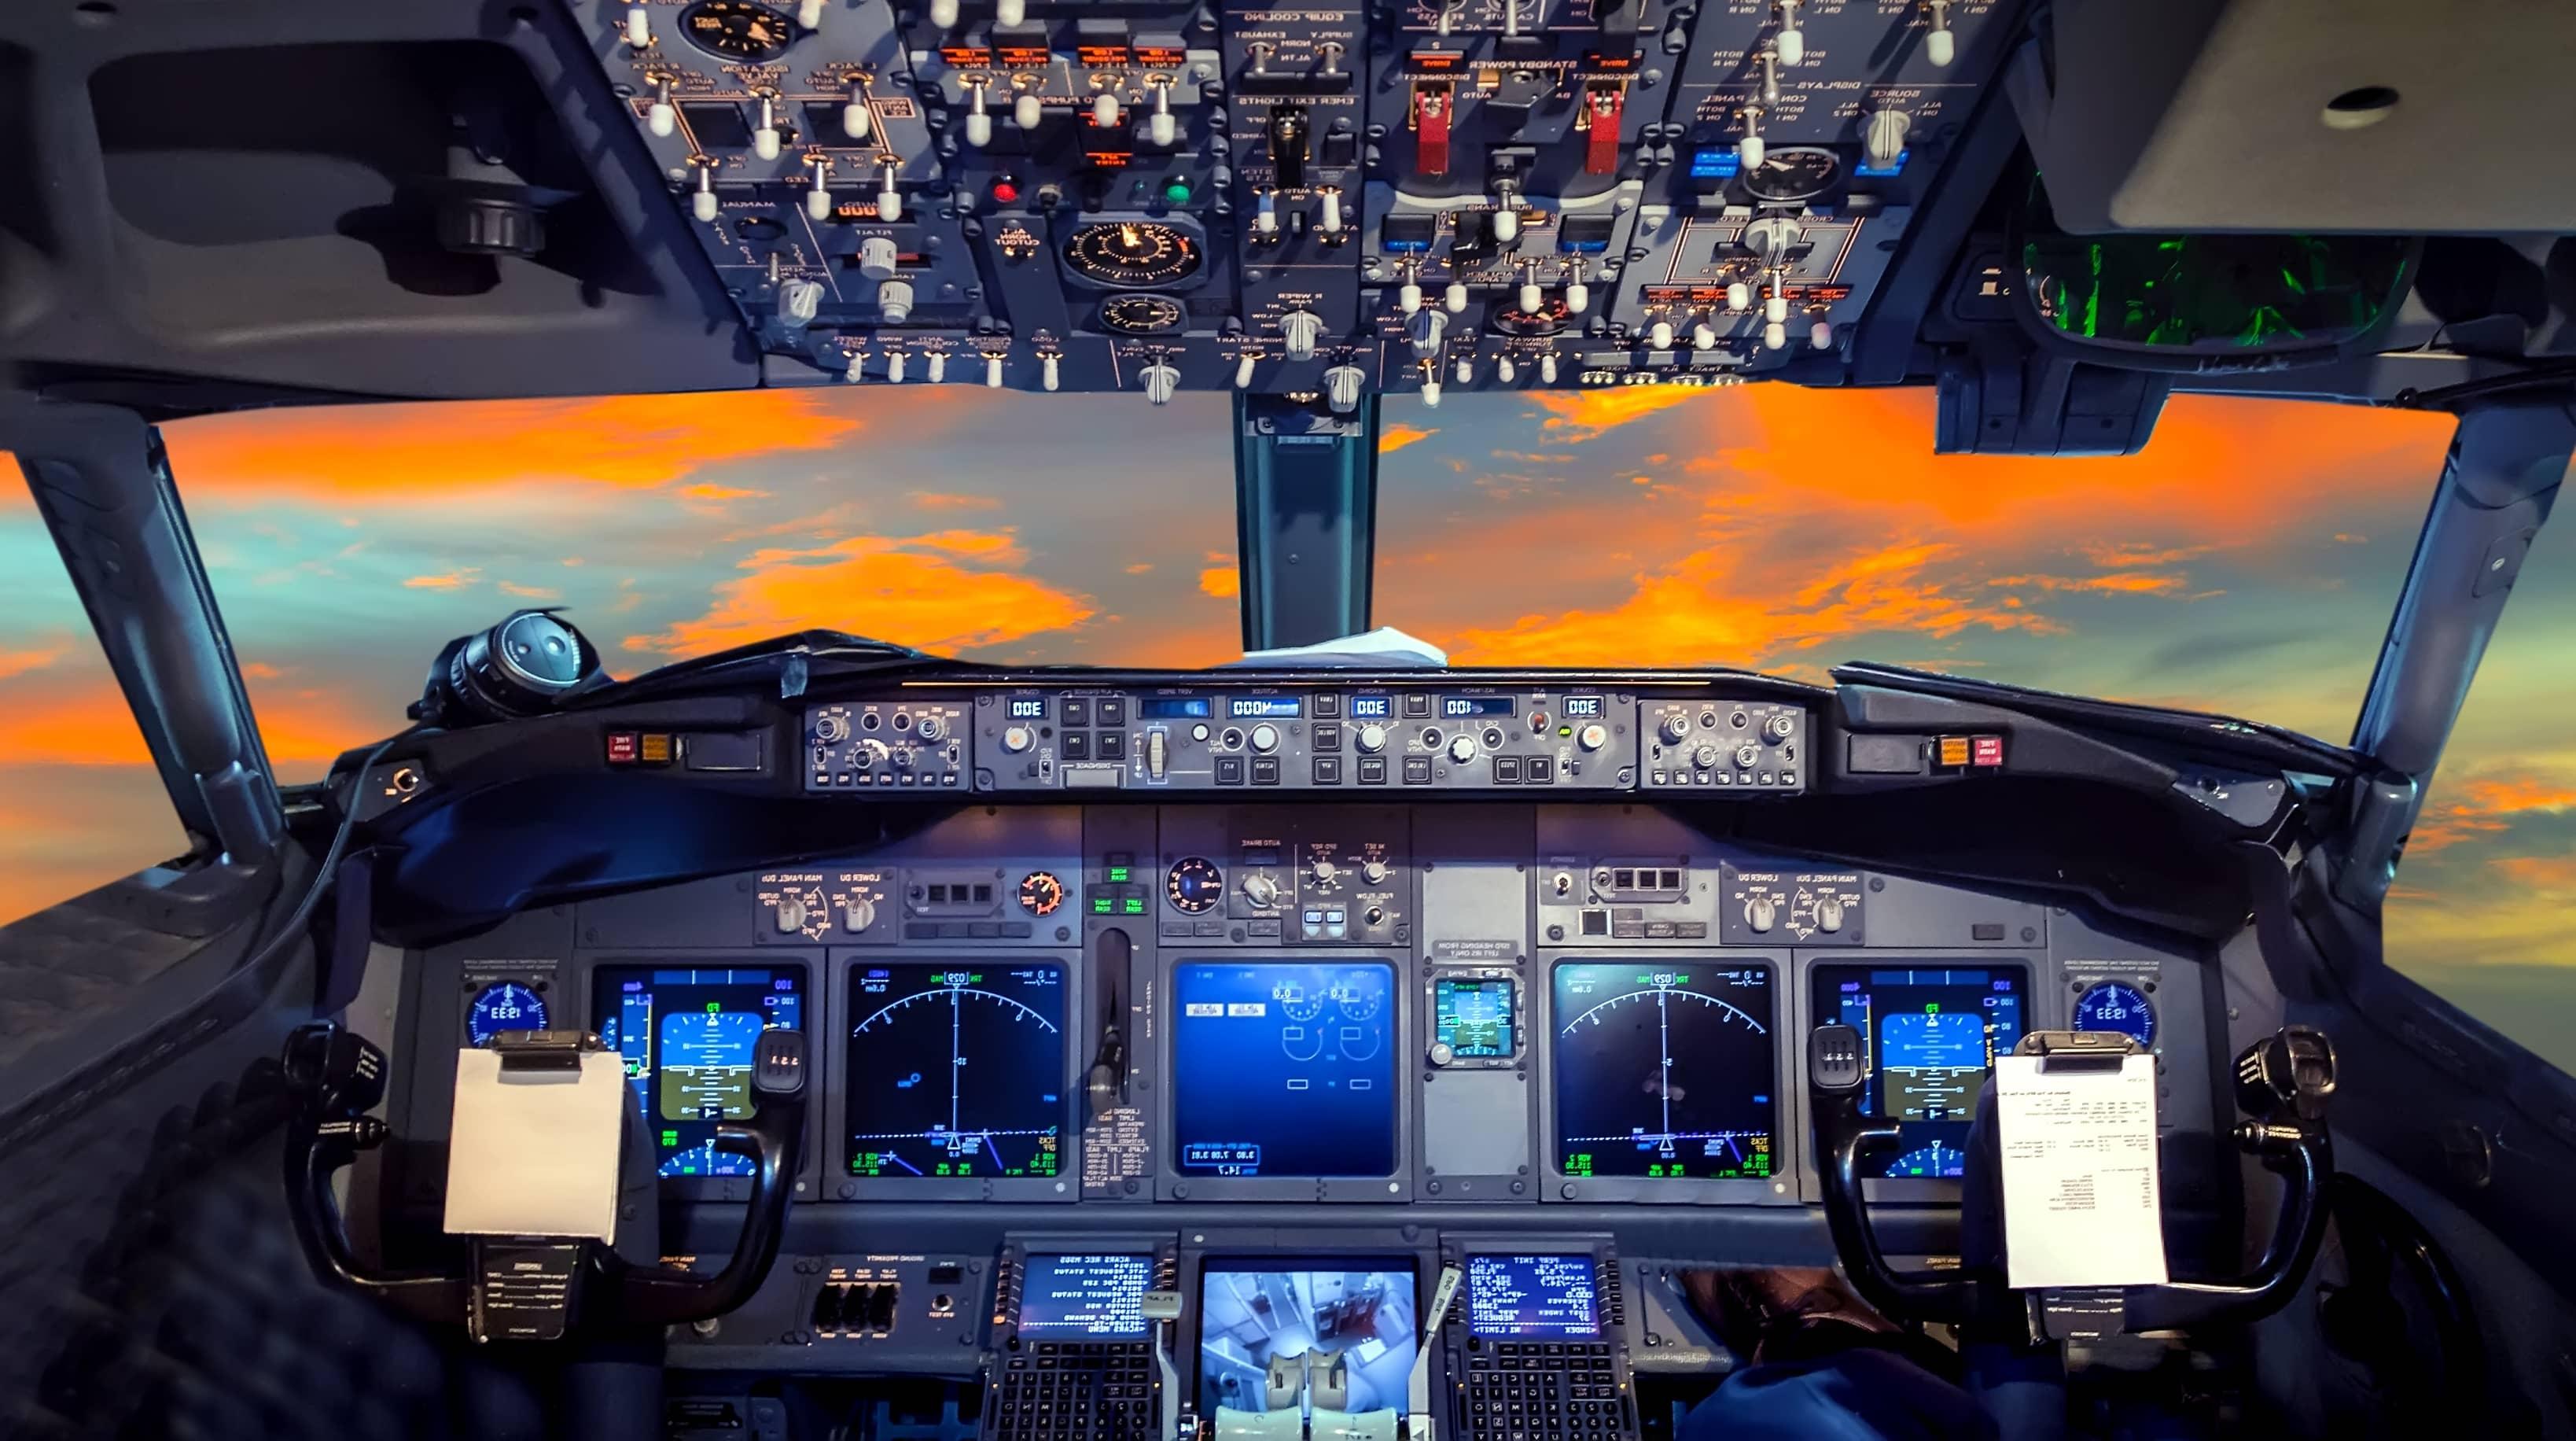 Cockpit_AdobeStock_107812956